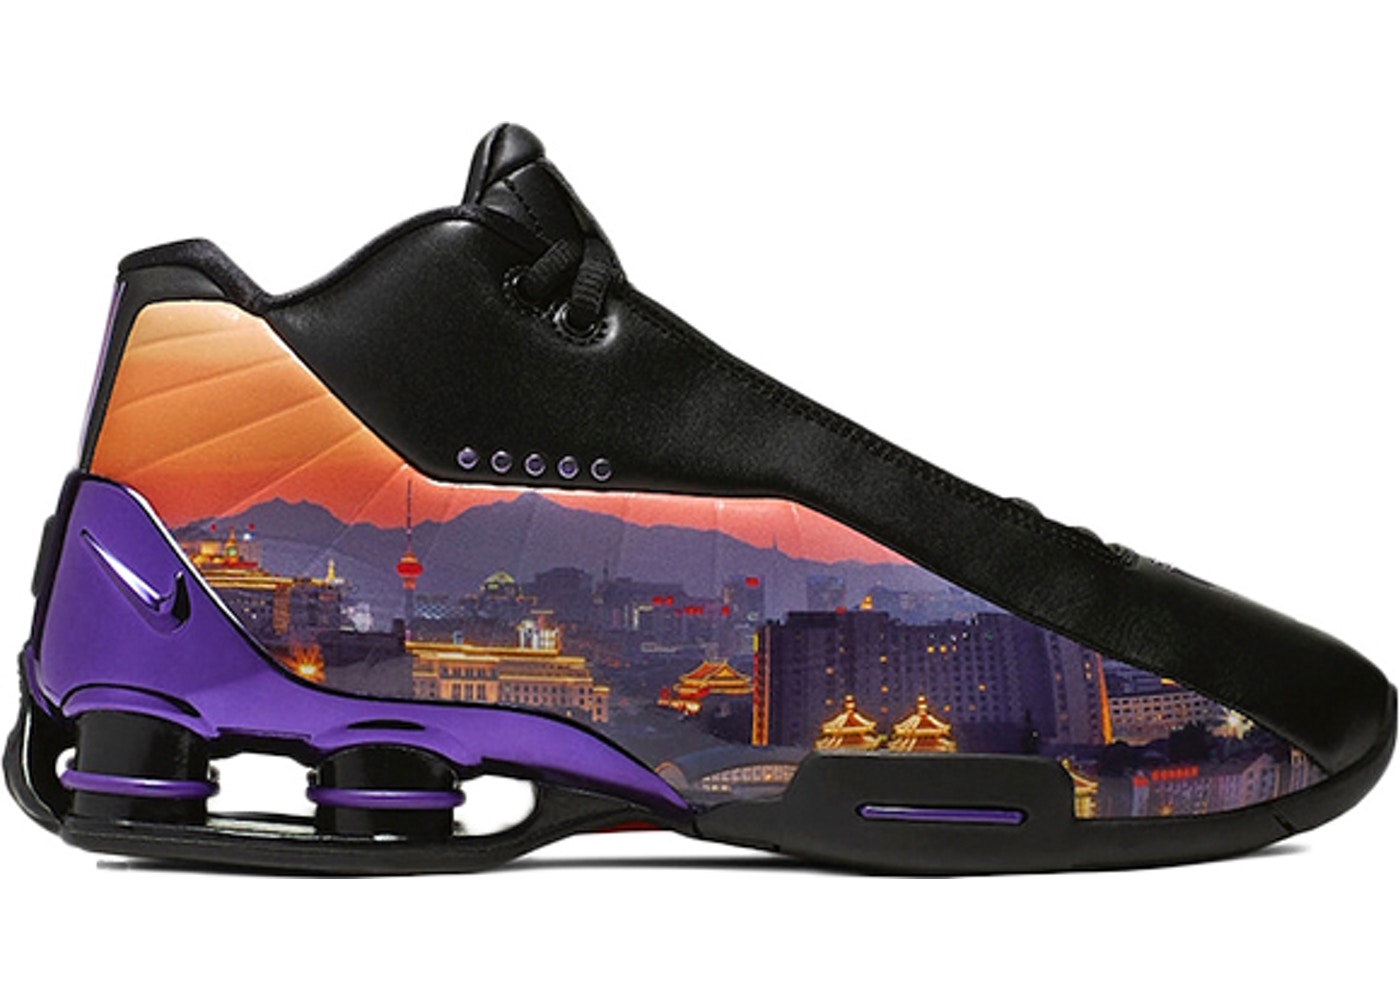 finest selection fbebd bde1b Nike Shox BB4 China Hoop Dreams